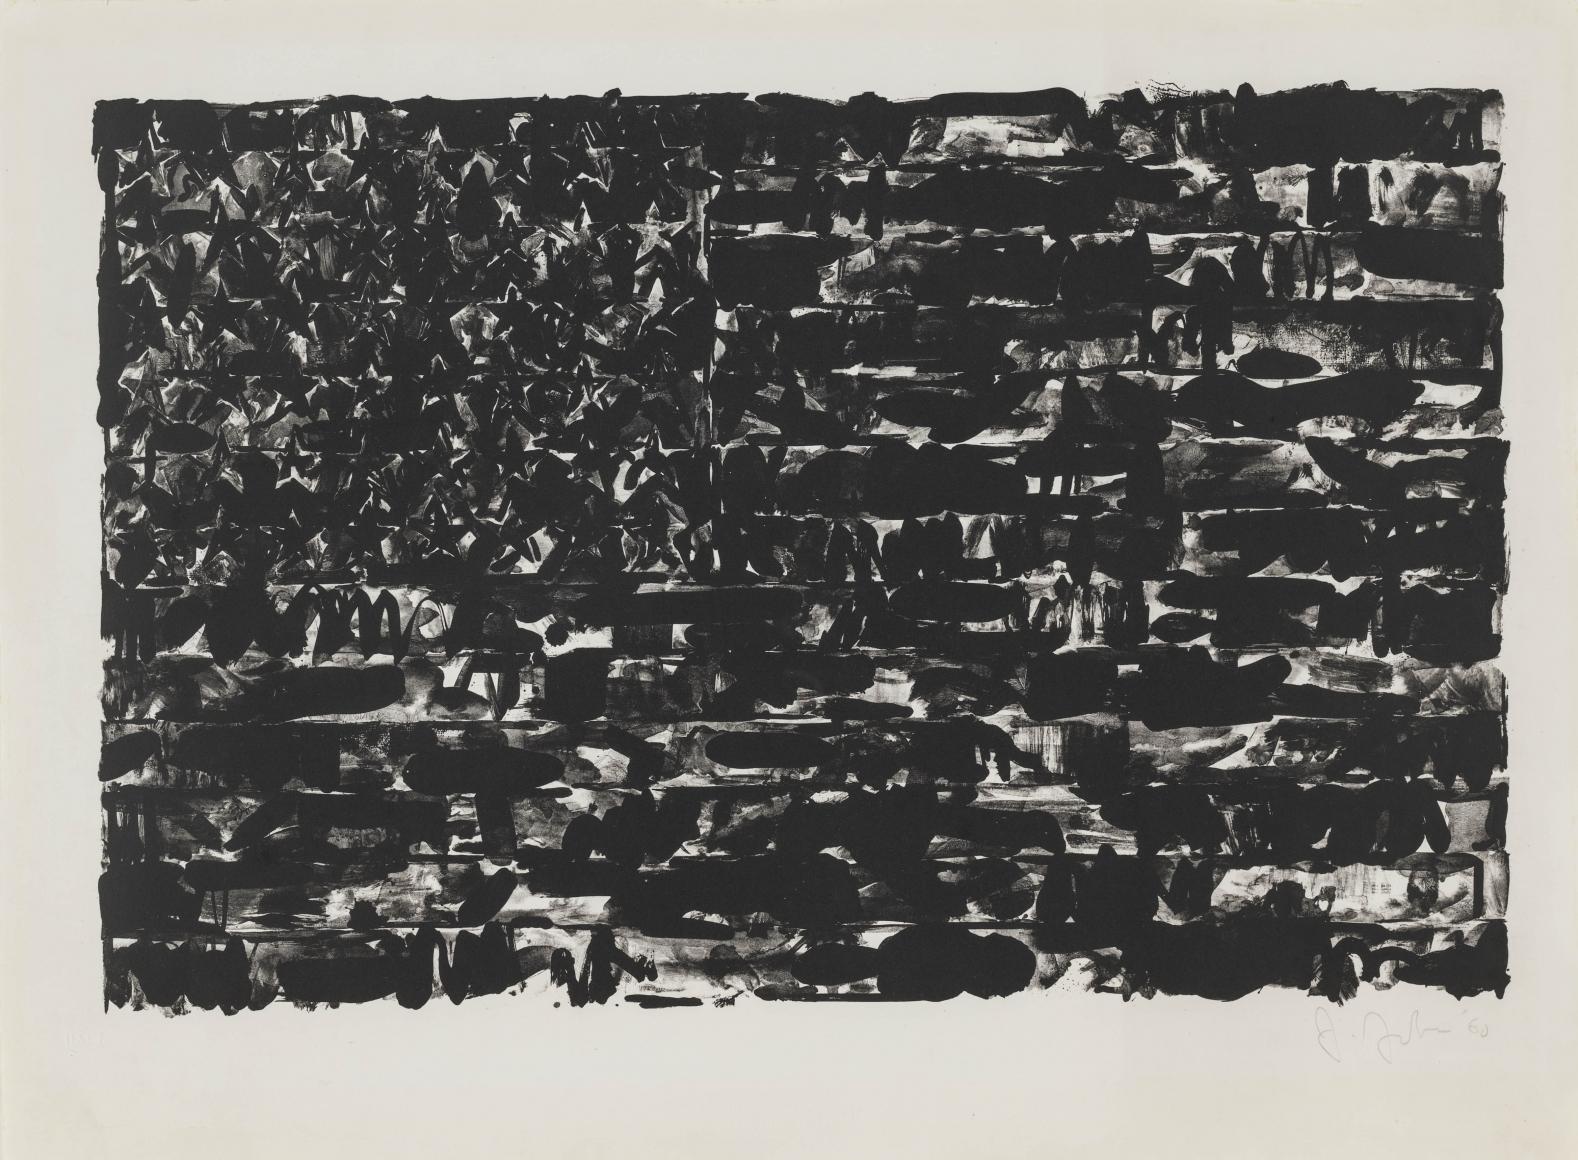 Jasper Johns - Artworks - Susan Sheehan Gallery